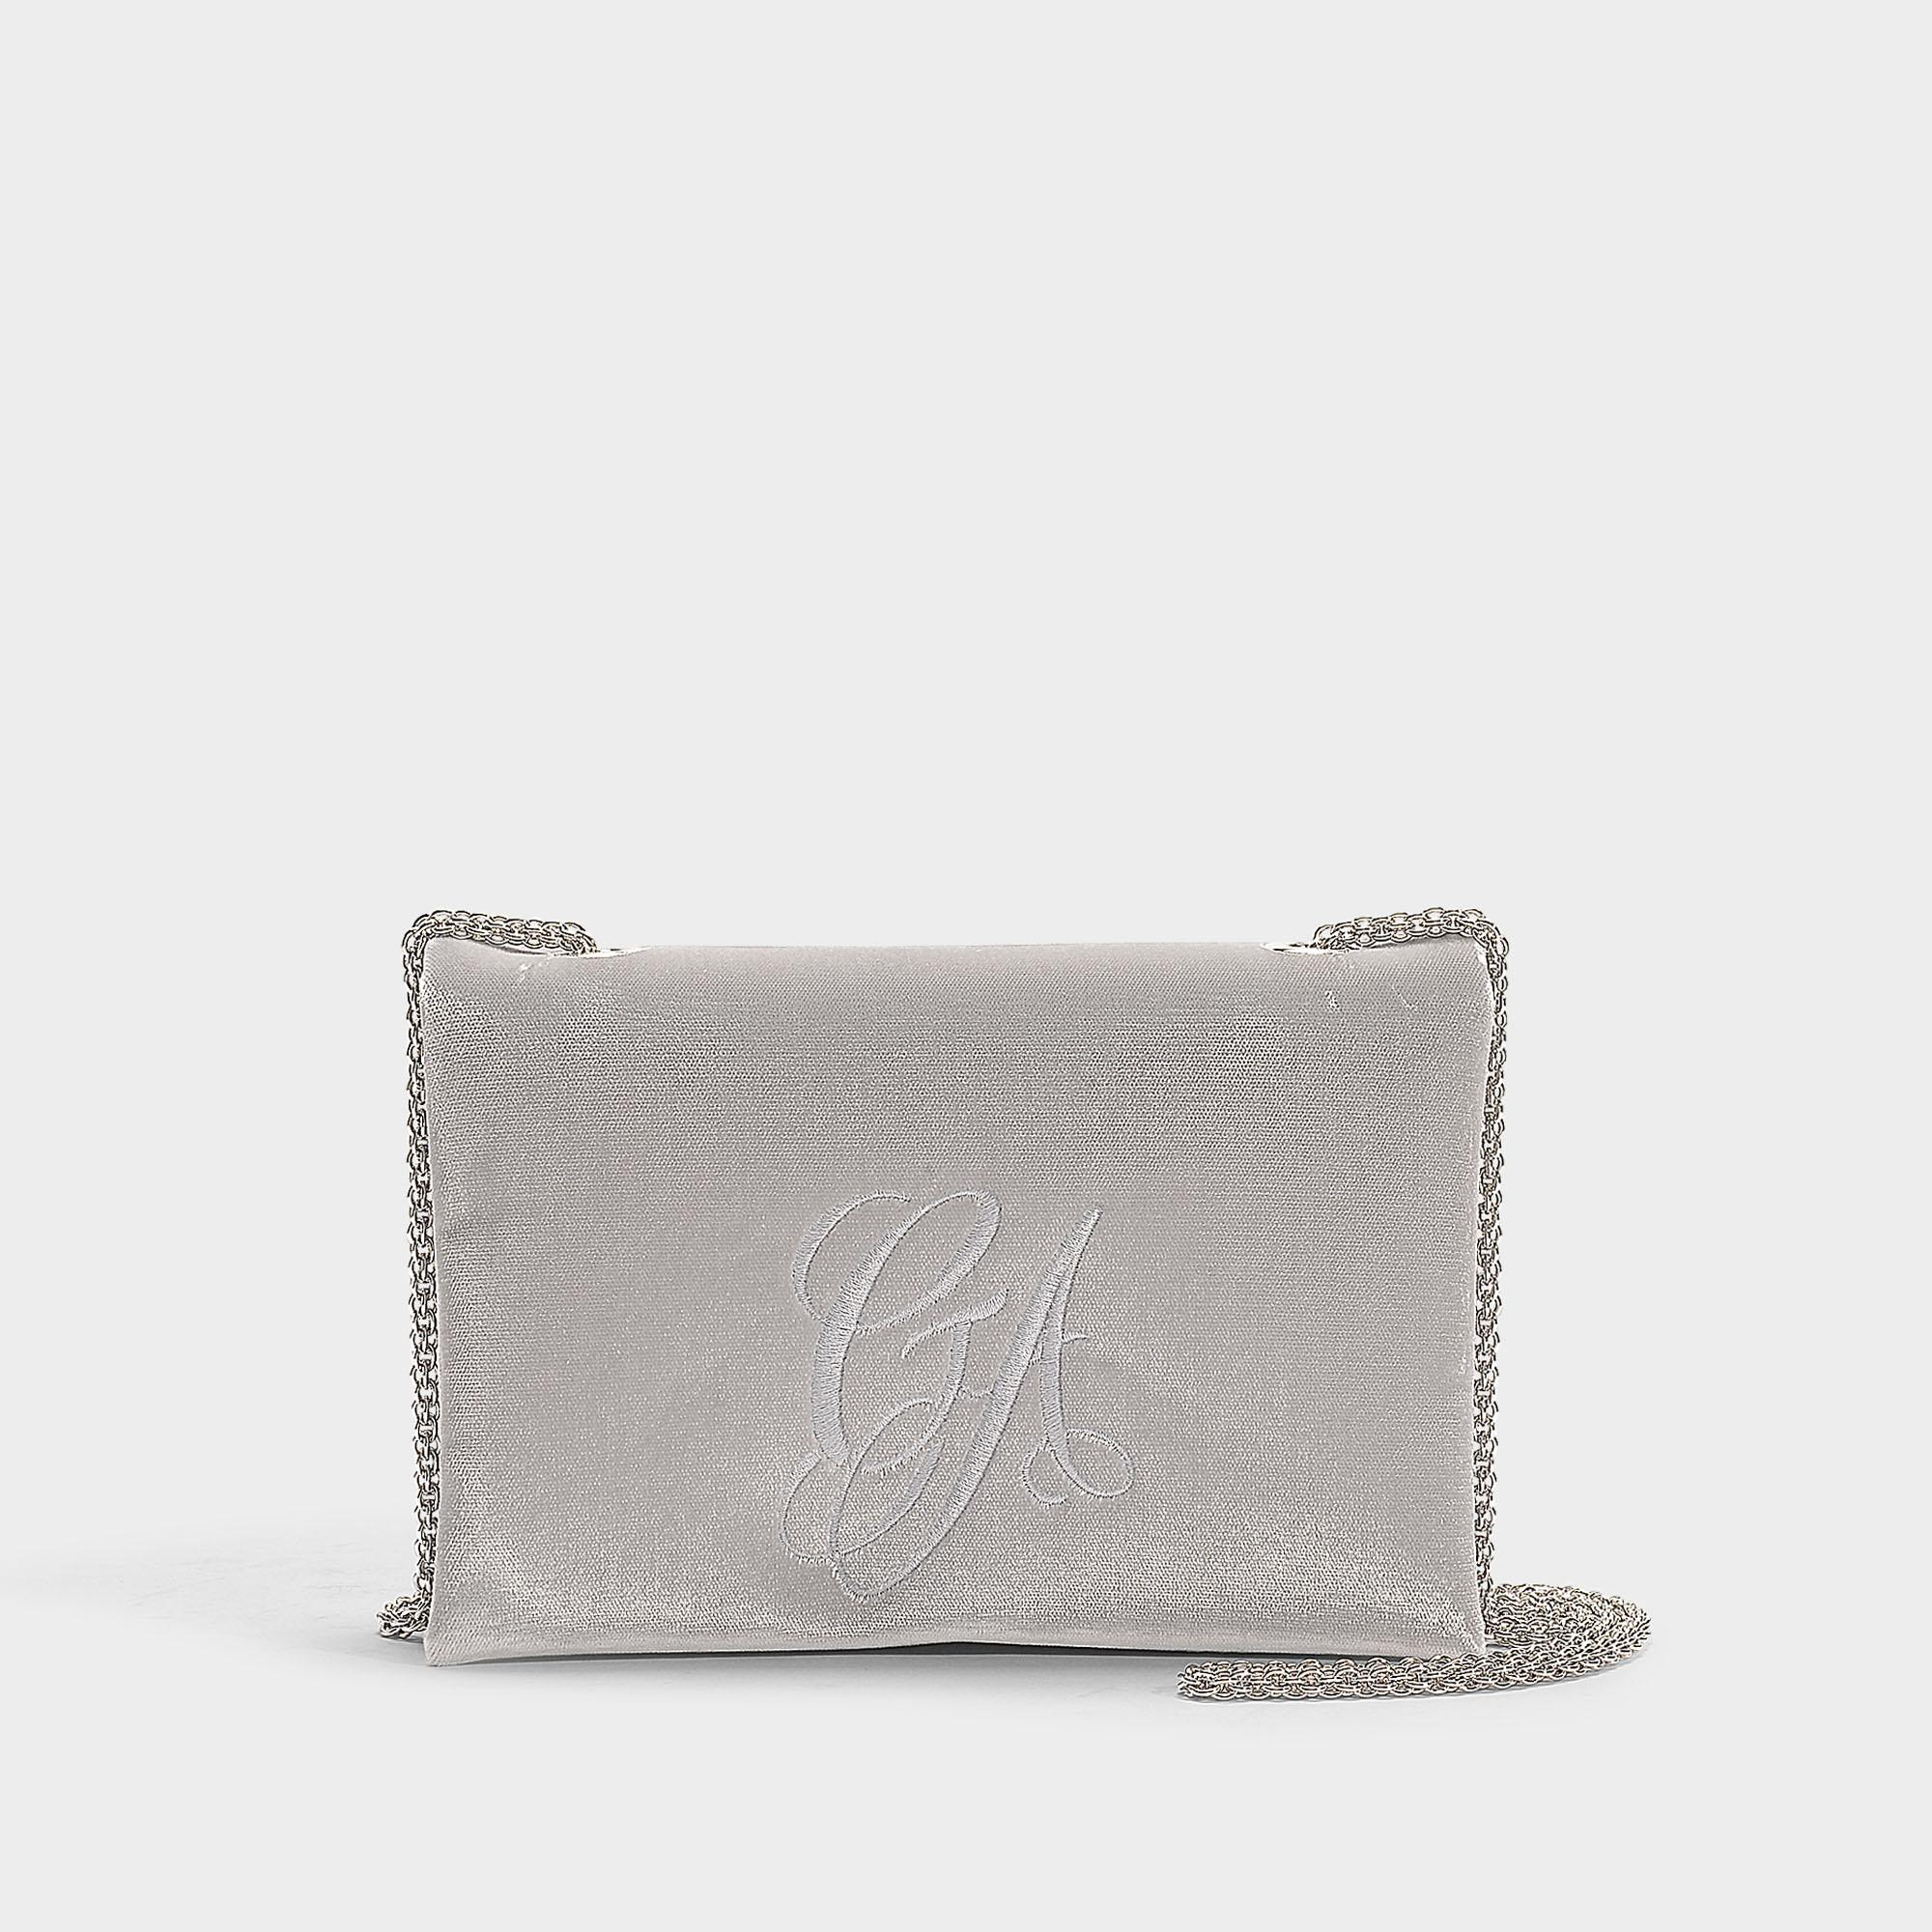 Lyst - Giorgio Armani Sling Bag In Grey Cotton in Gray - Save ... b1ecc54085